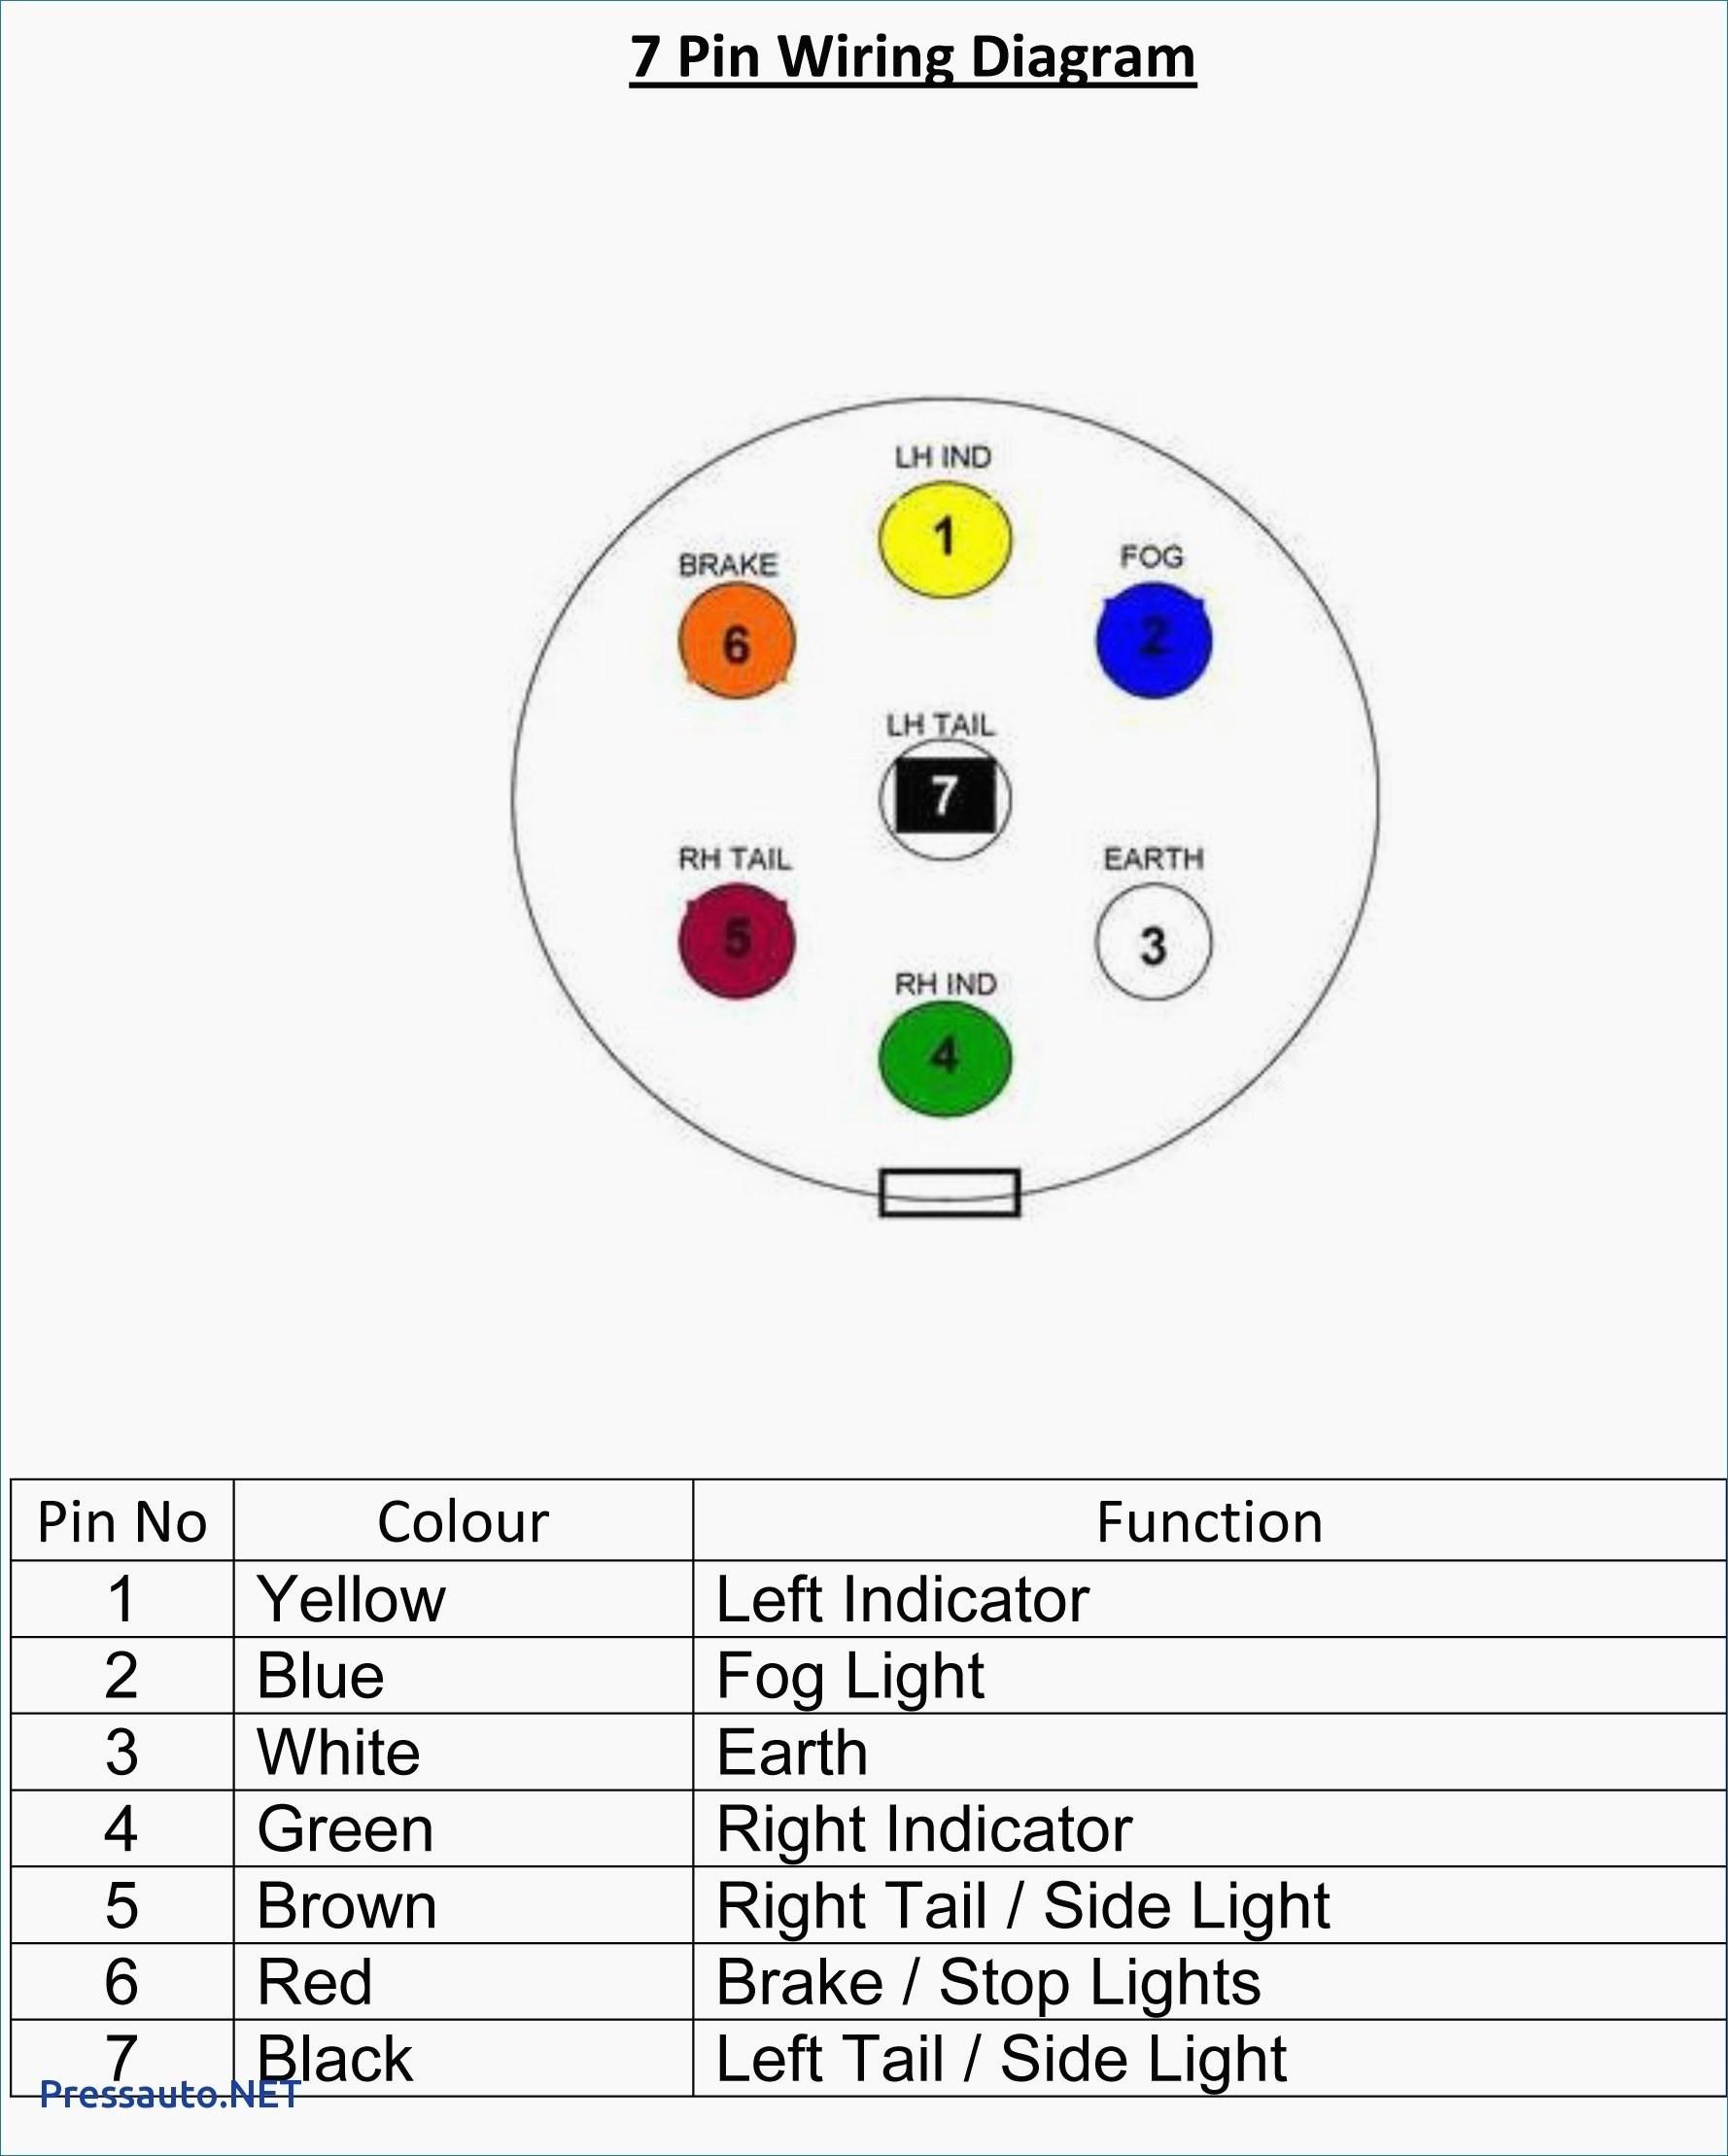 Gmc 7 Wire Plug Diagram - Wiring Diagram Data - 7 Blade Trailer Connector Wiring Diagram